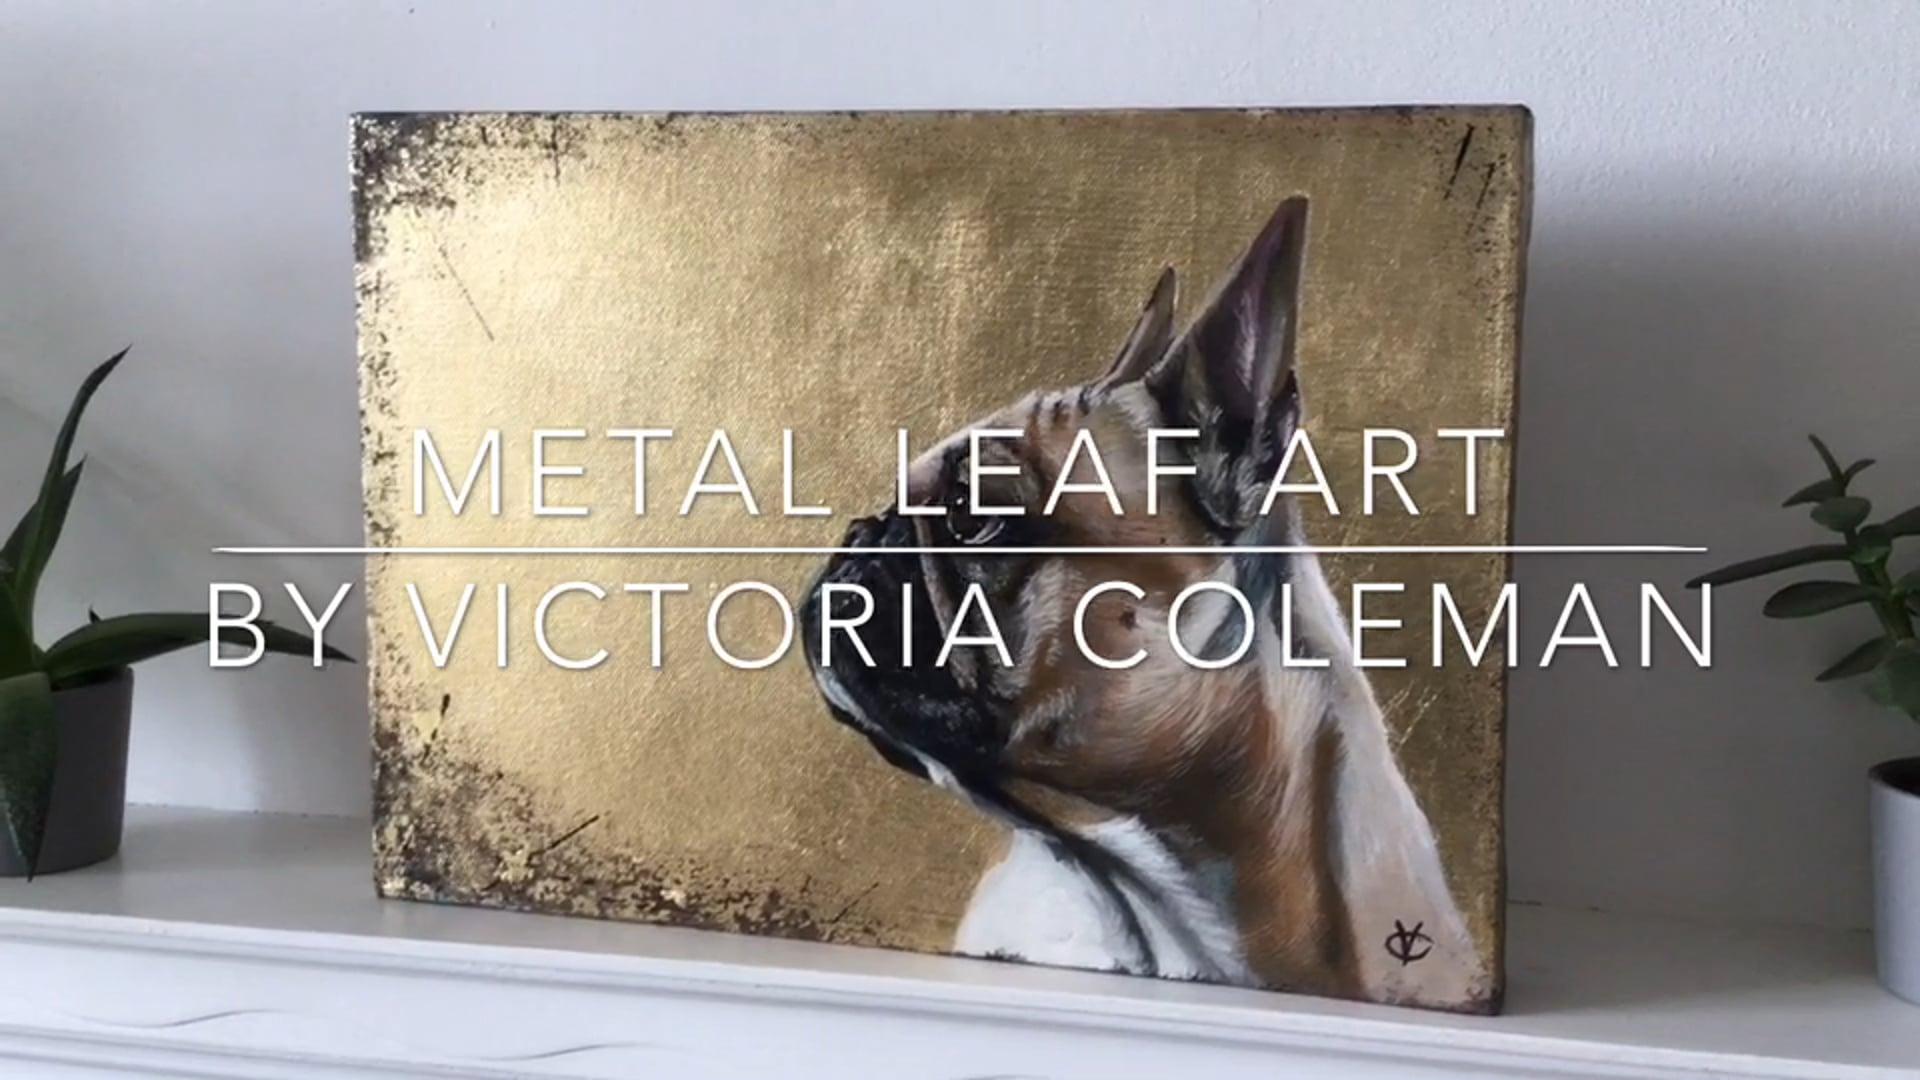 Metal leaf art by Victoria Coleman